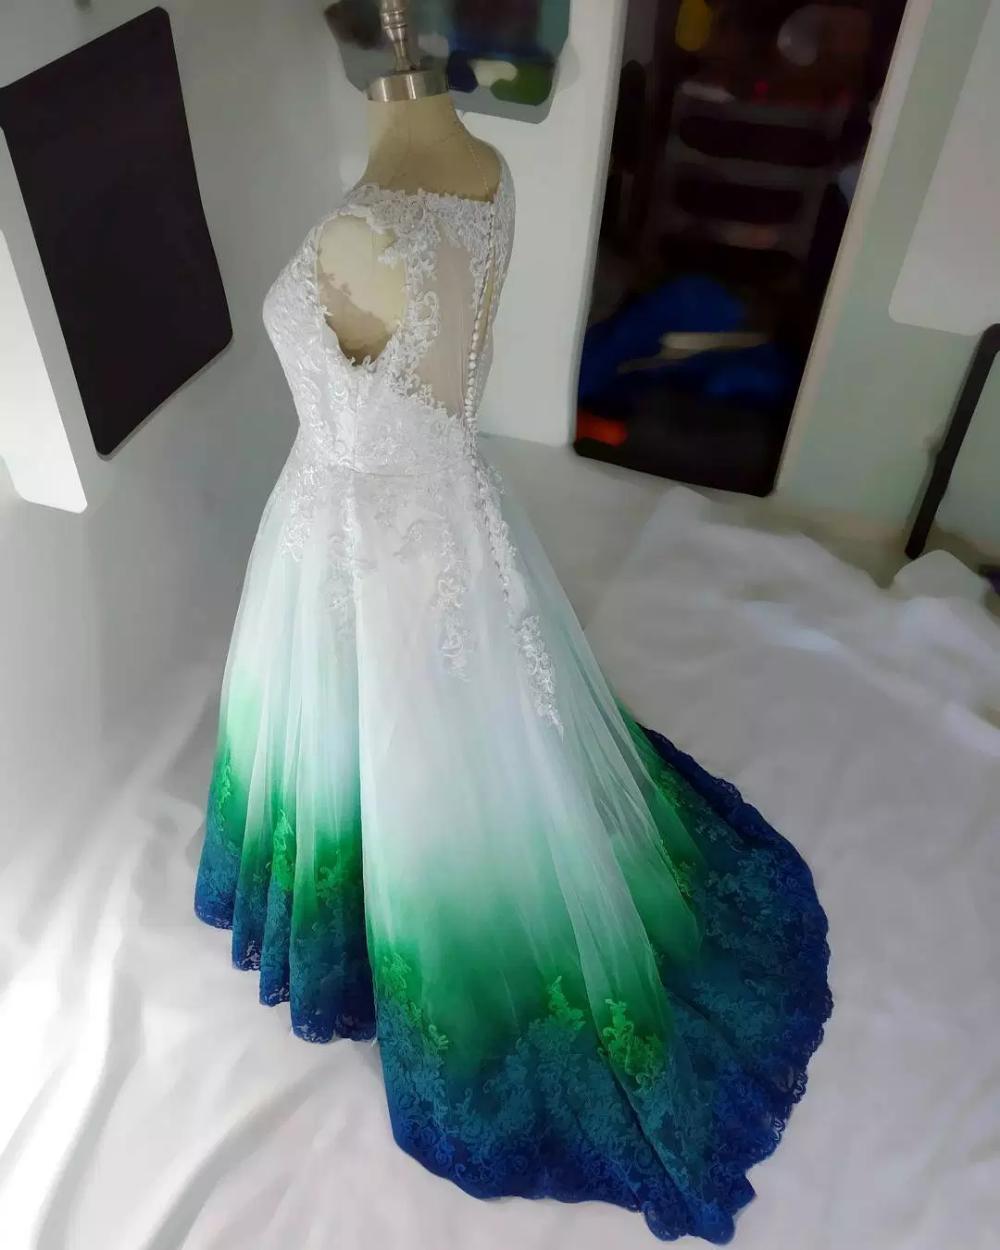 Green Teal Blue Dip Dye Wedding Dresses By Taylor Ann Linko Dip Dye Wedding Dress Blue Wedding Dresses Camo Wedding Dresses [ 1250 x 1000 Pixel ]